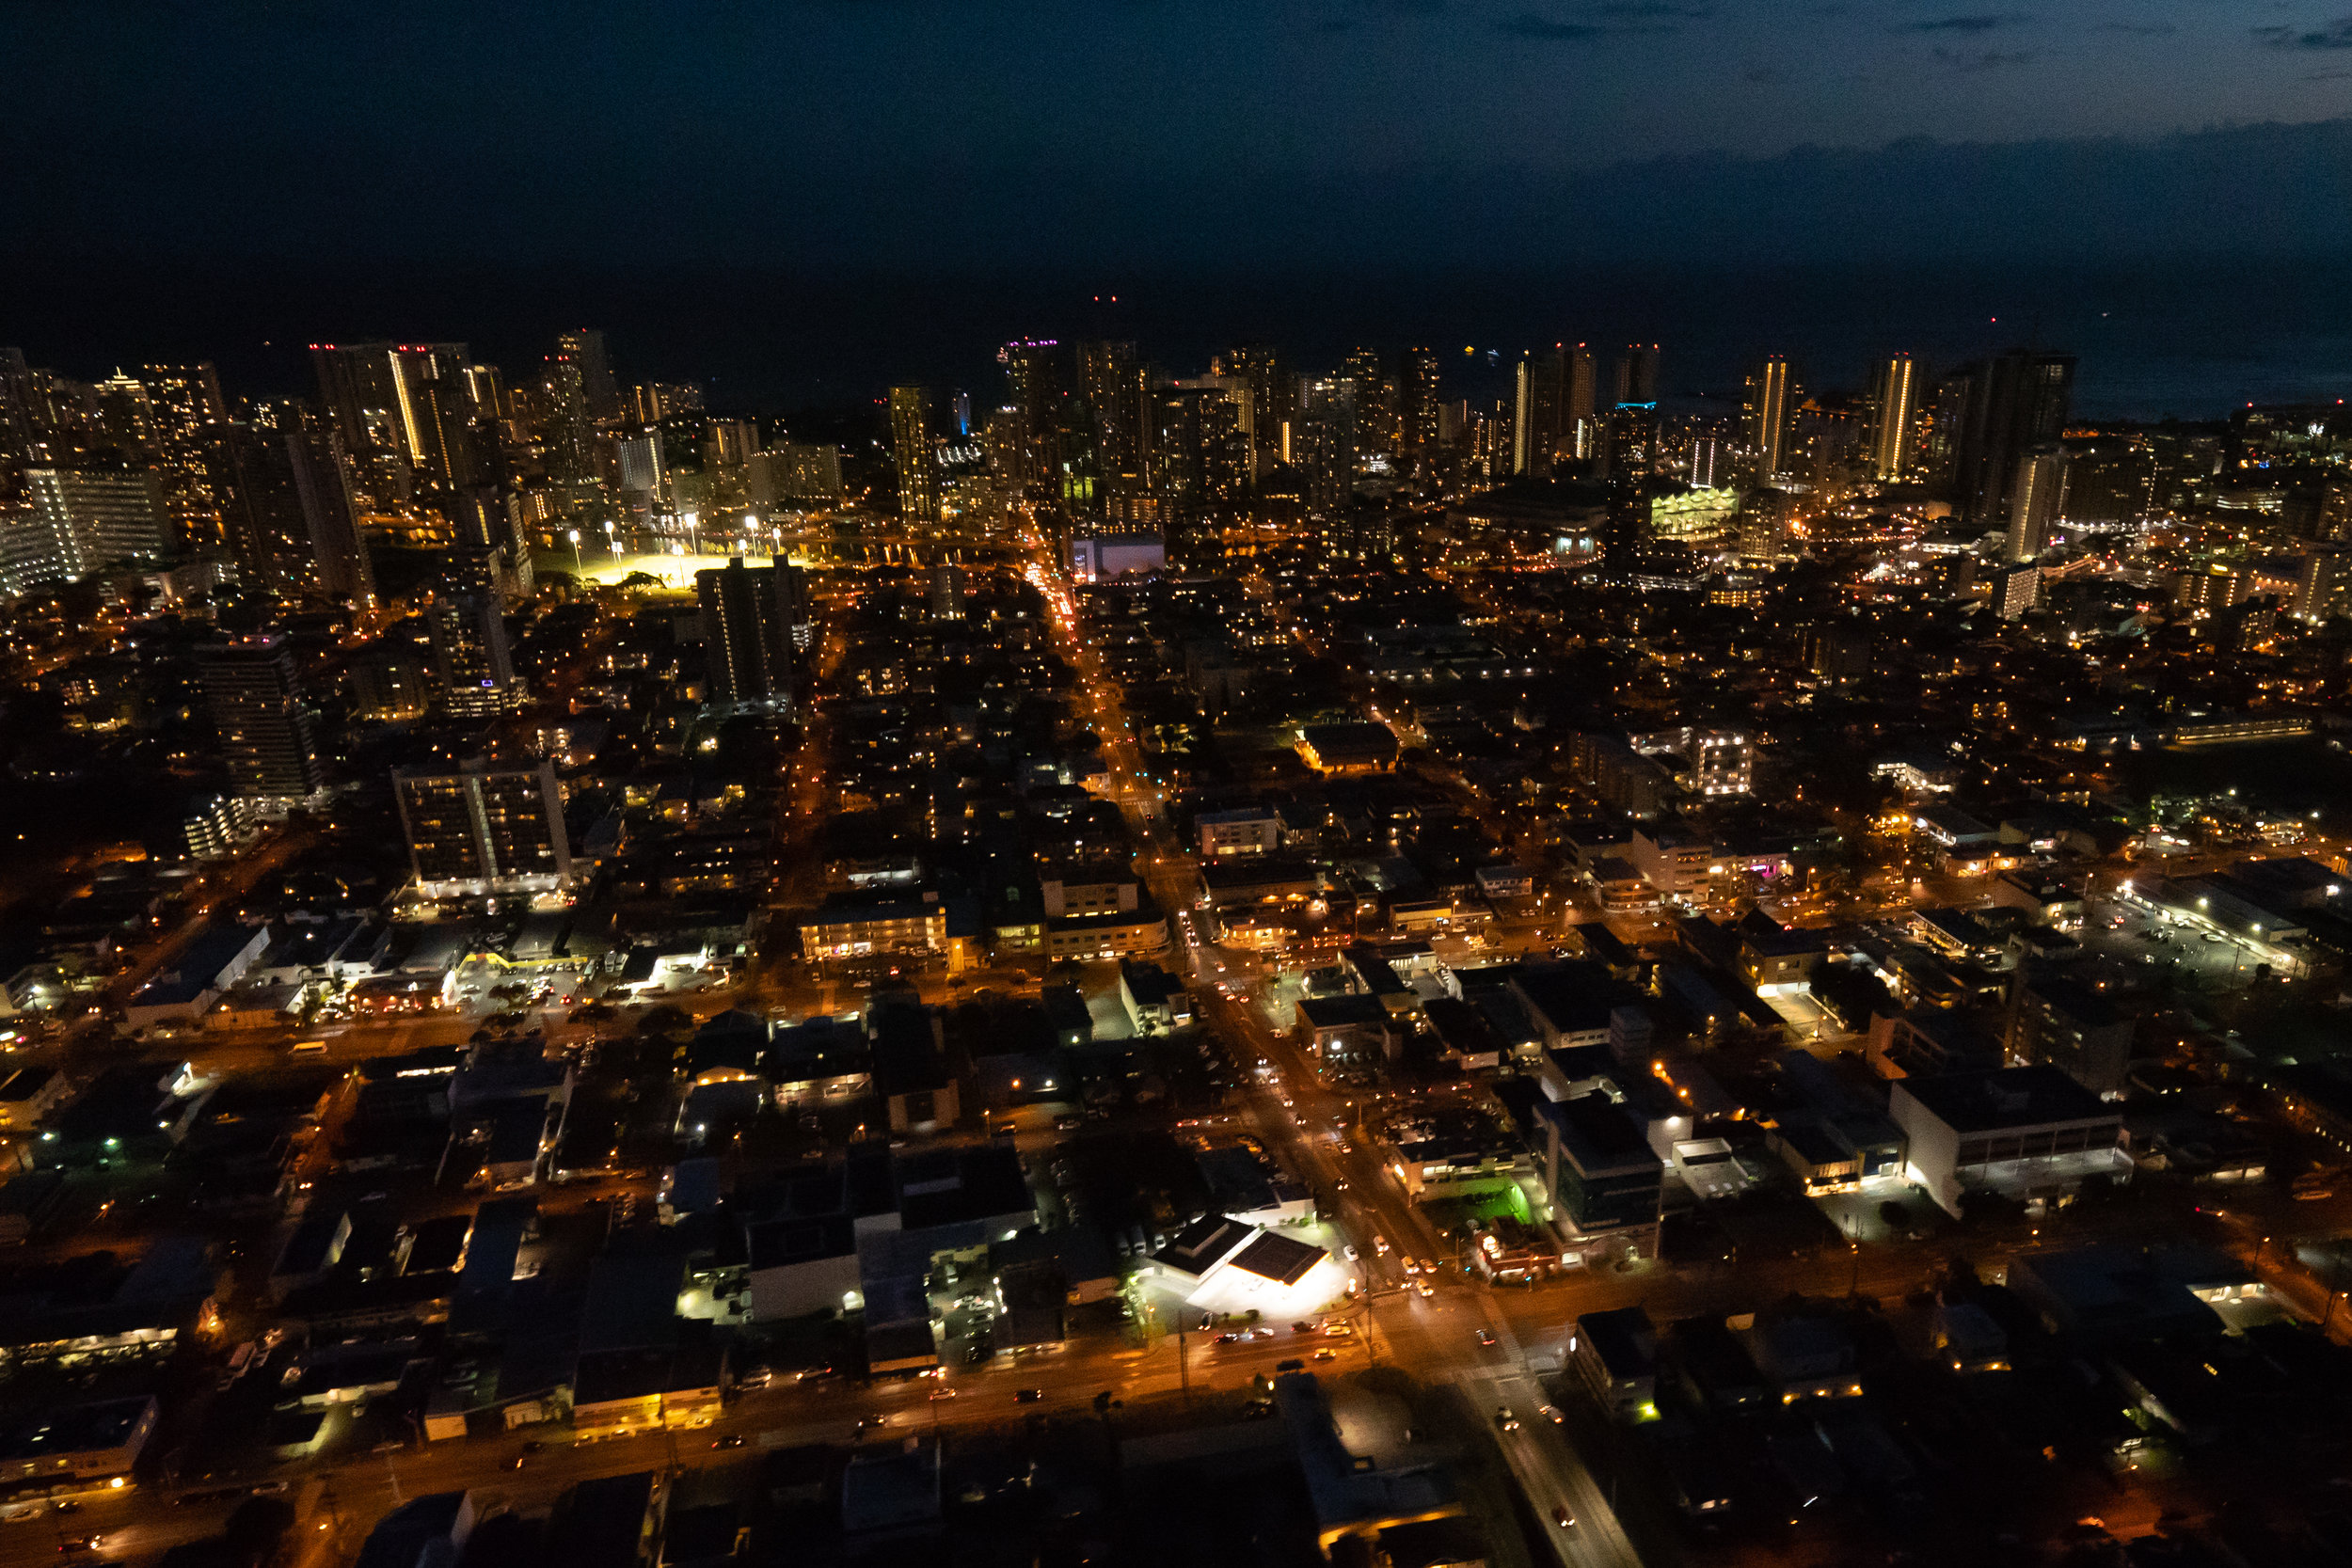 20180601_JohnsonControls_Aerial_Honolulu-5996.jpg